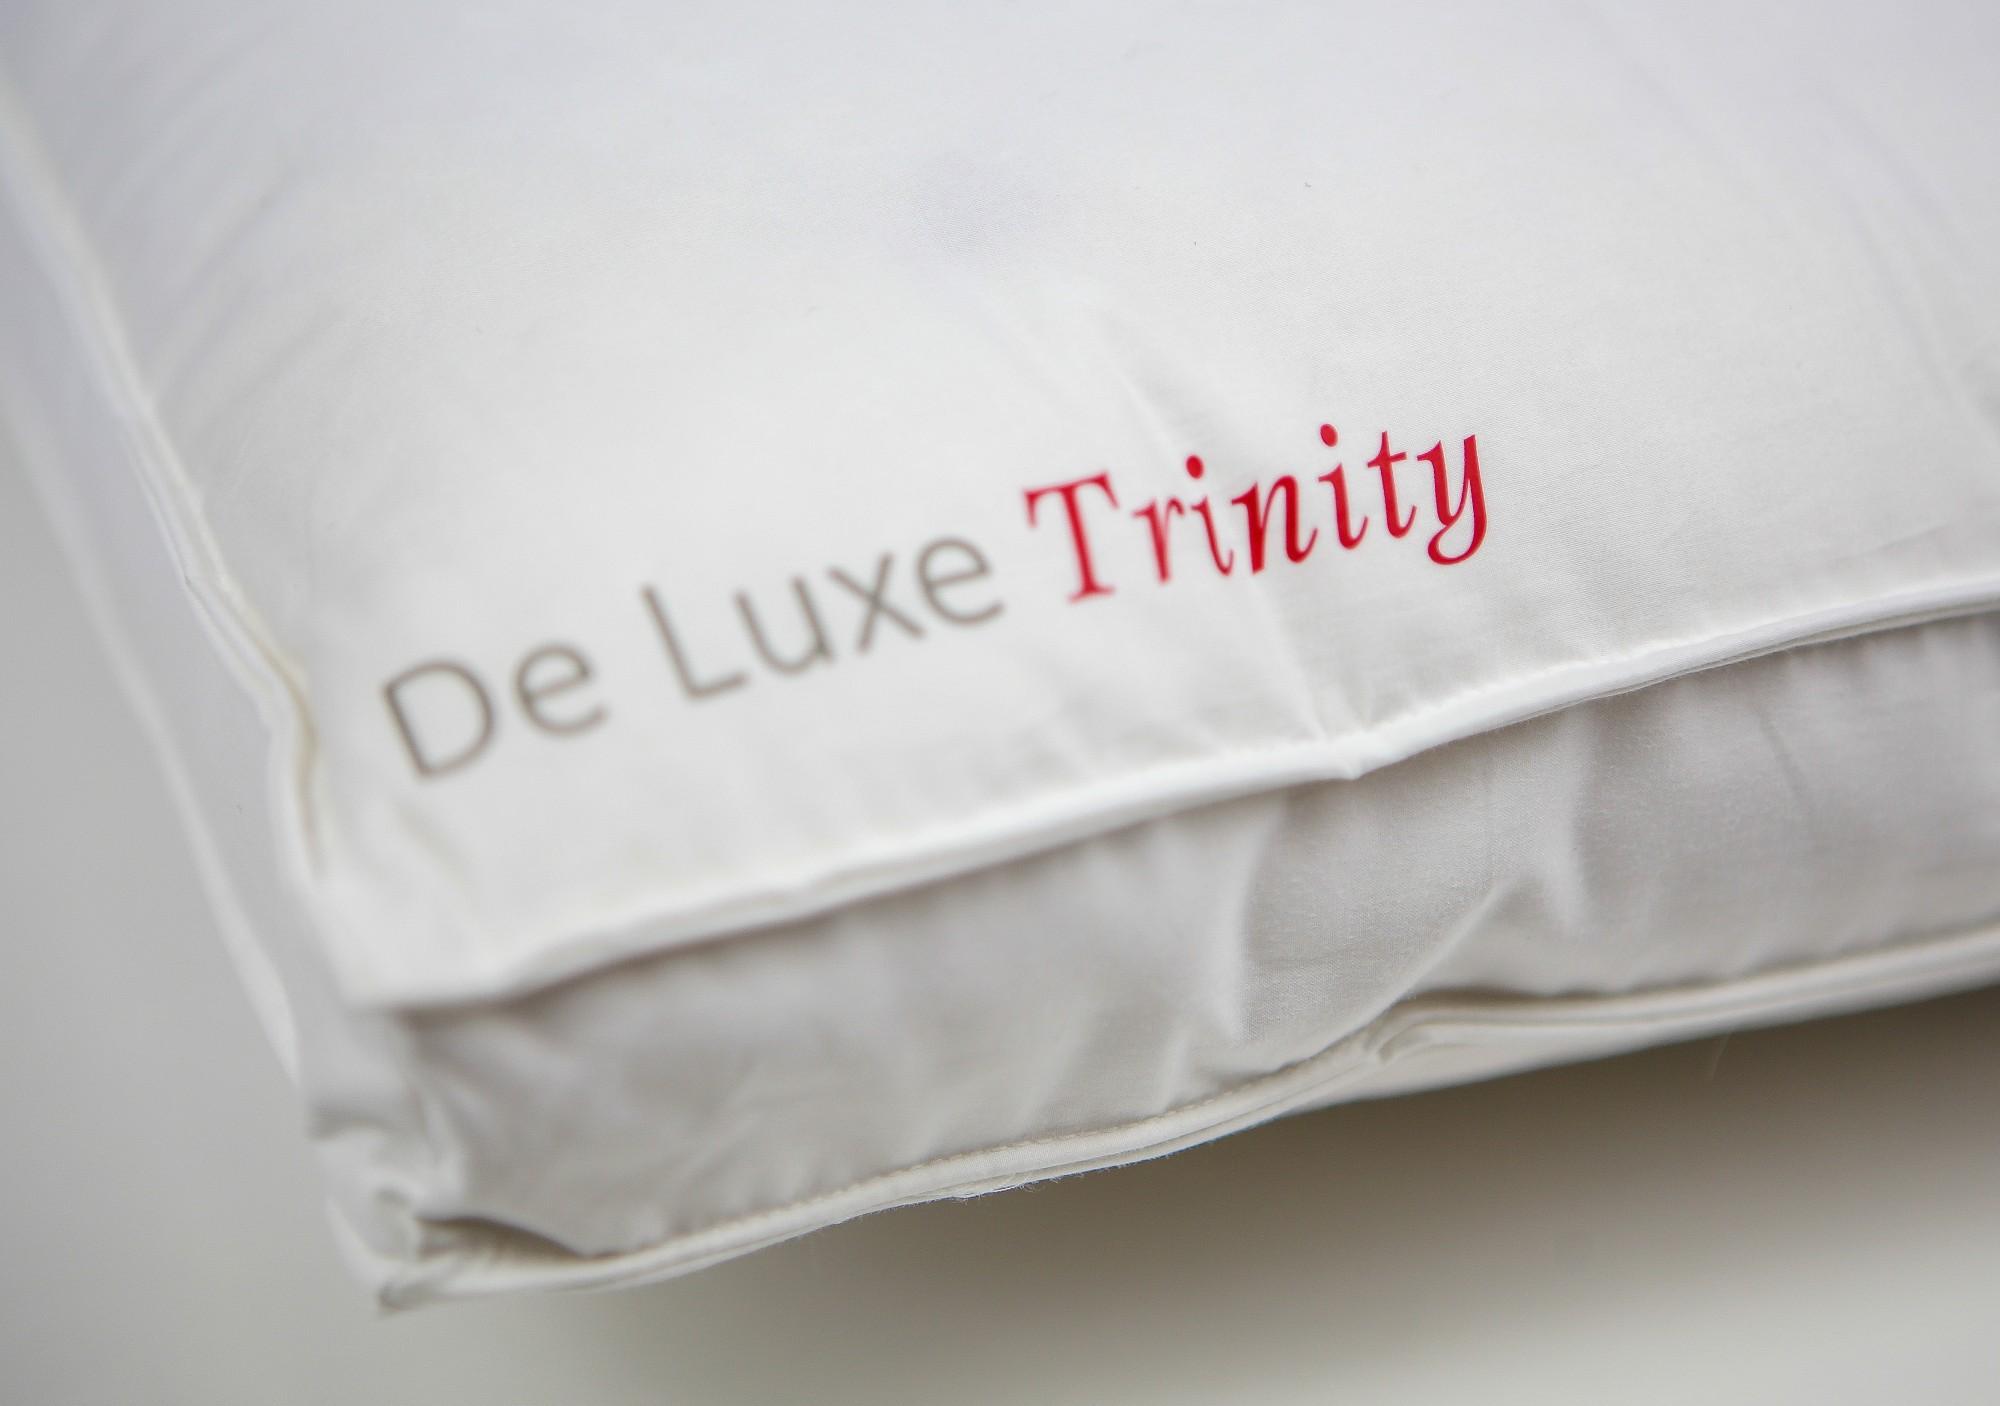 Подушка Kauffmann пухо-перовая 3-камерная  50х70 De Luxe-Trinity medium средняя